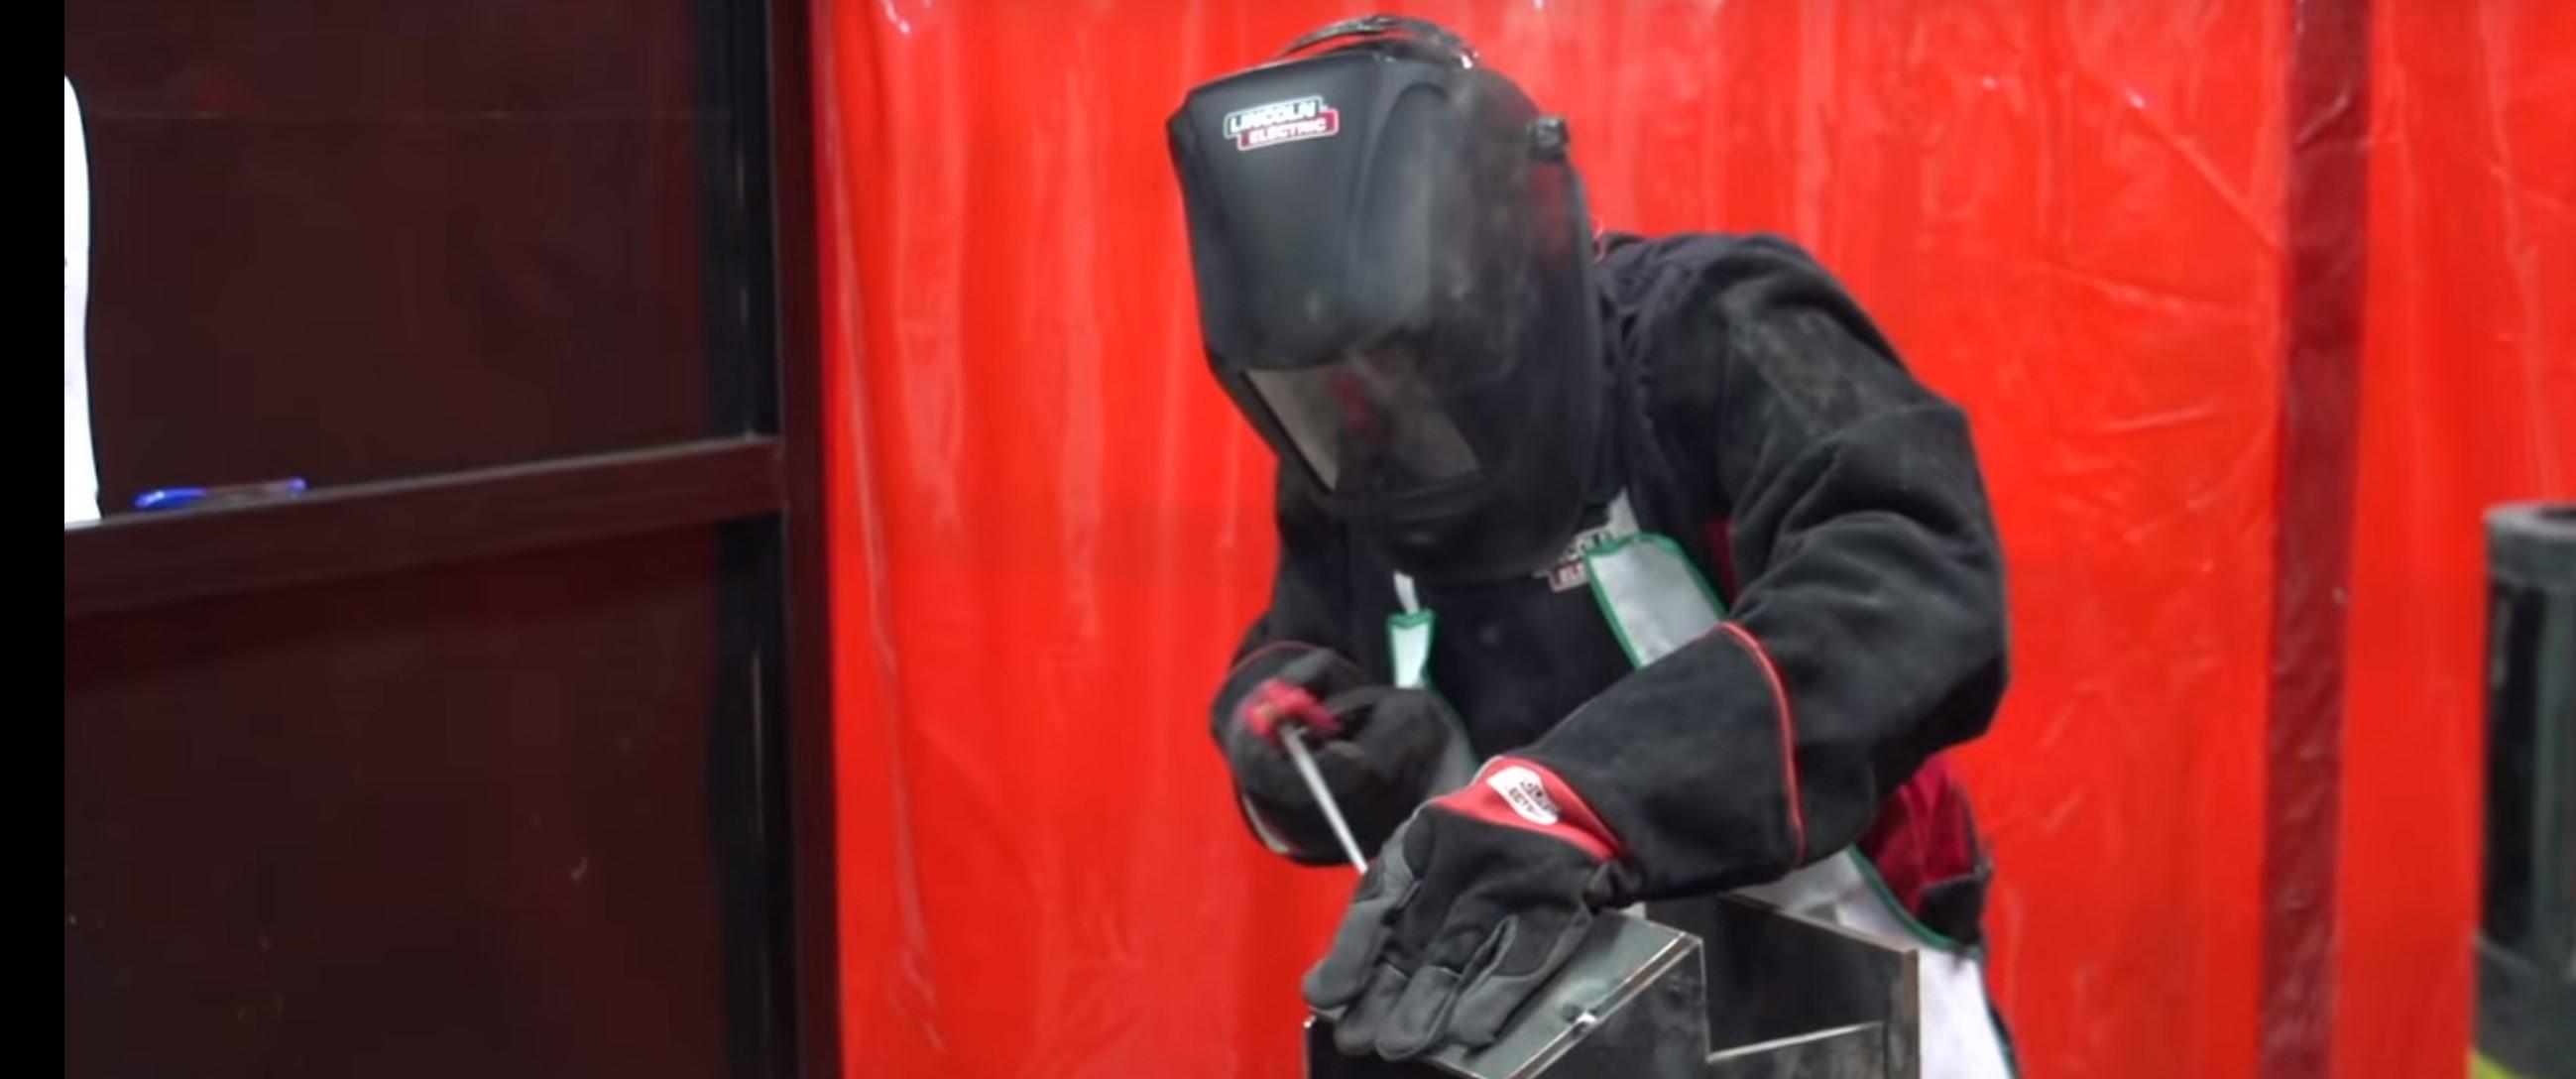 WSKA2018_welding.jpg